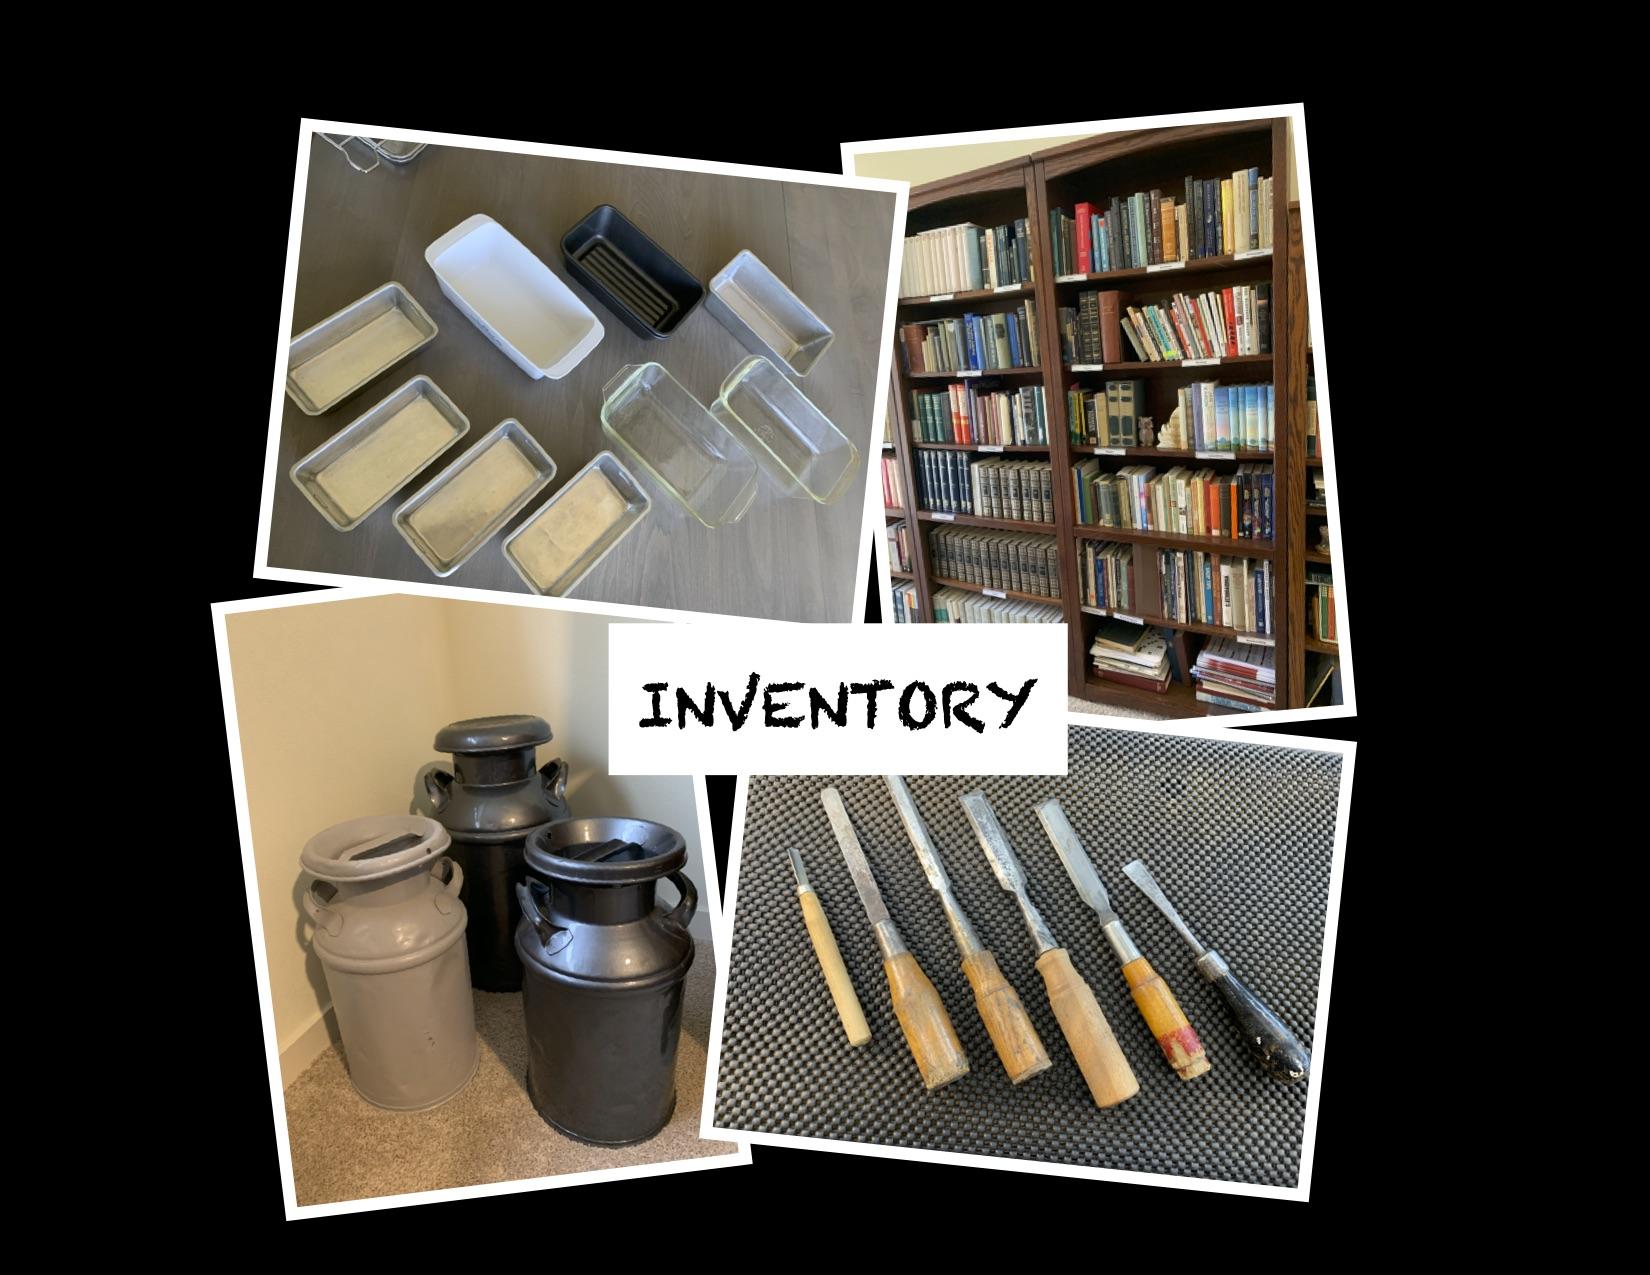 inventory photos